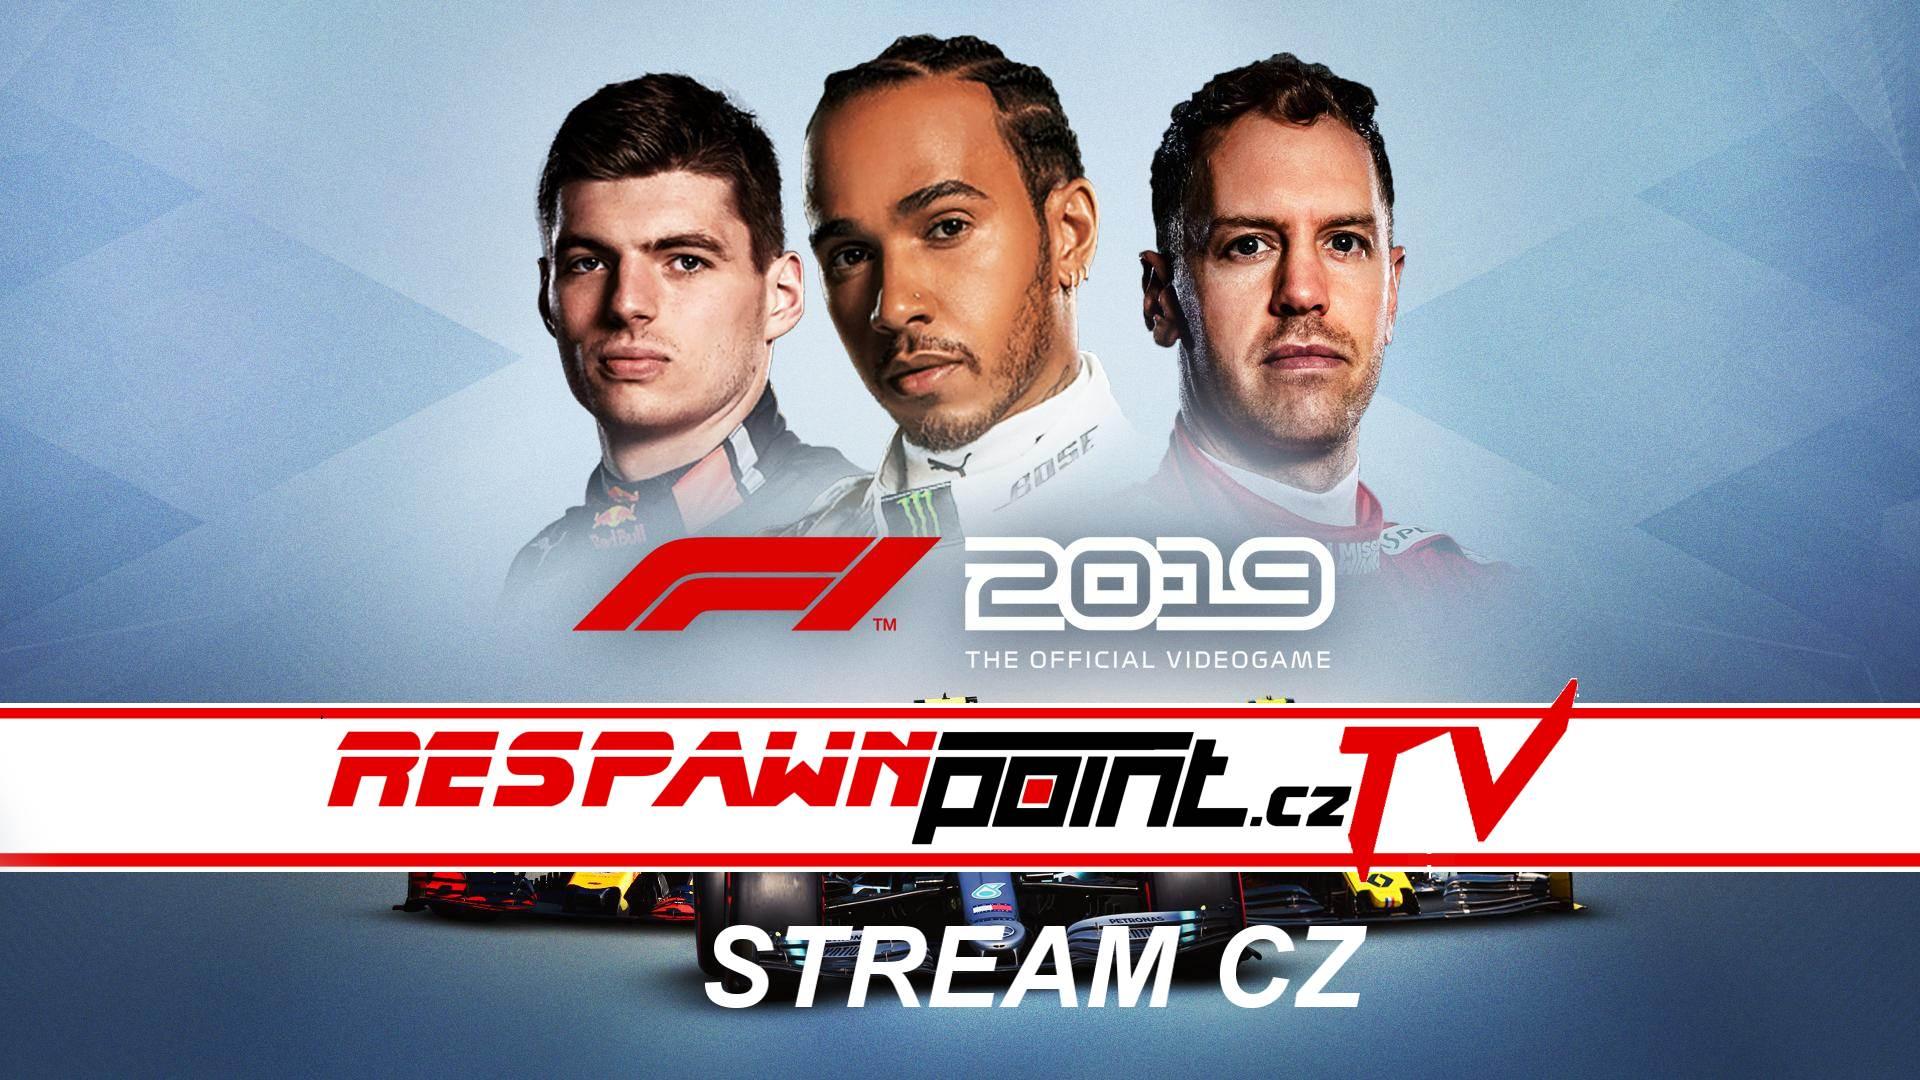 F1 2019 – Stream CZ